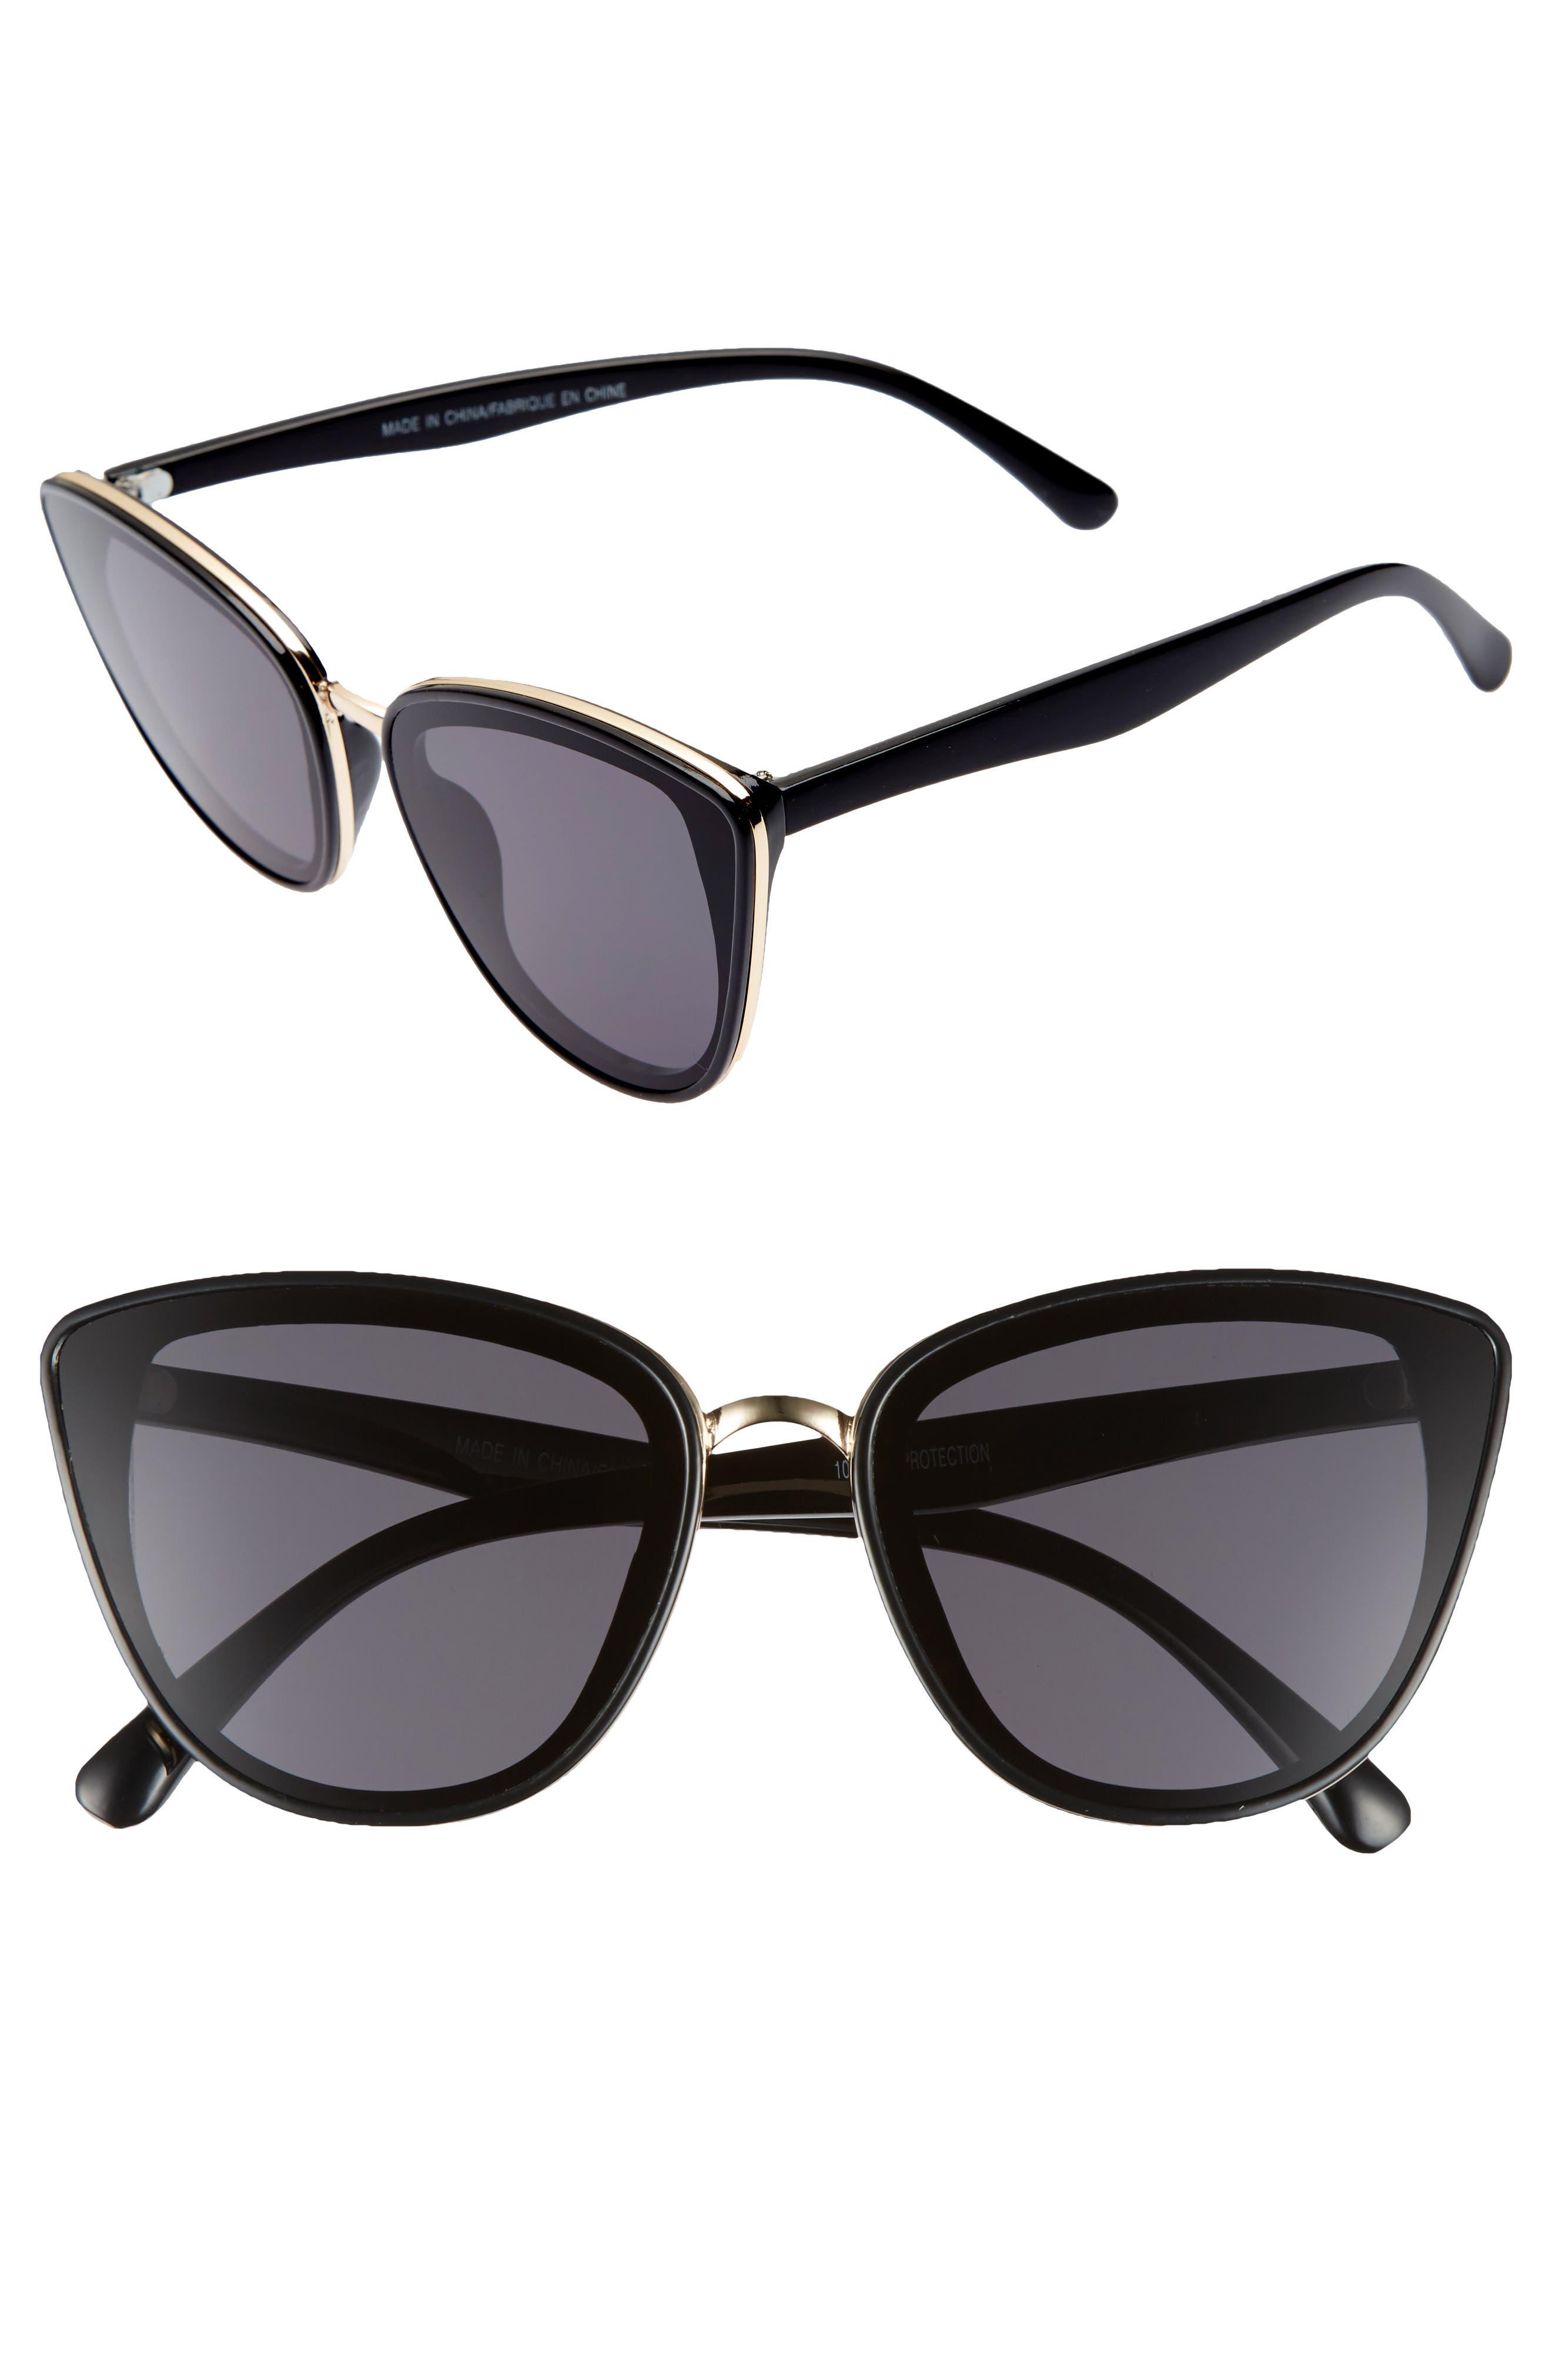 Main Image - BP. 59mm Perfect Cat Eye Sunglasses